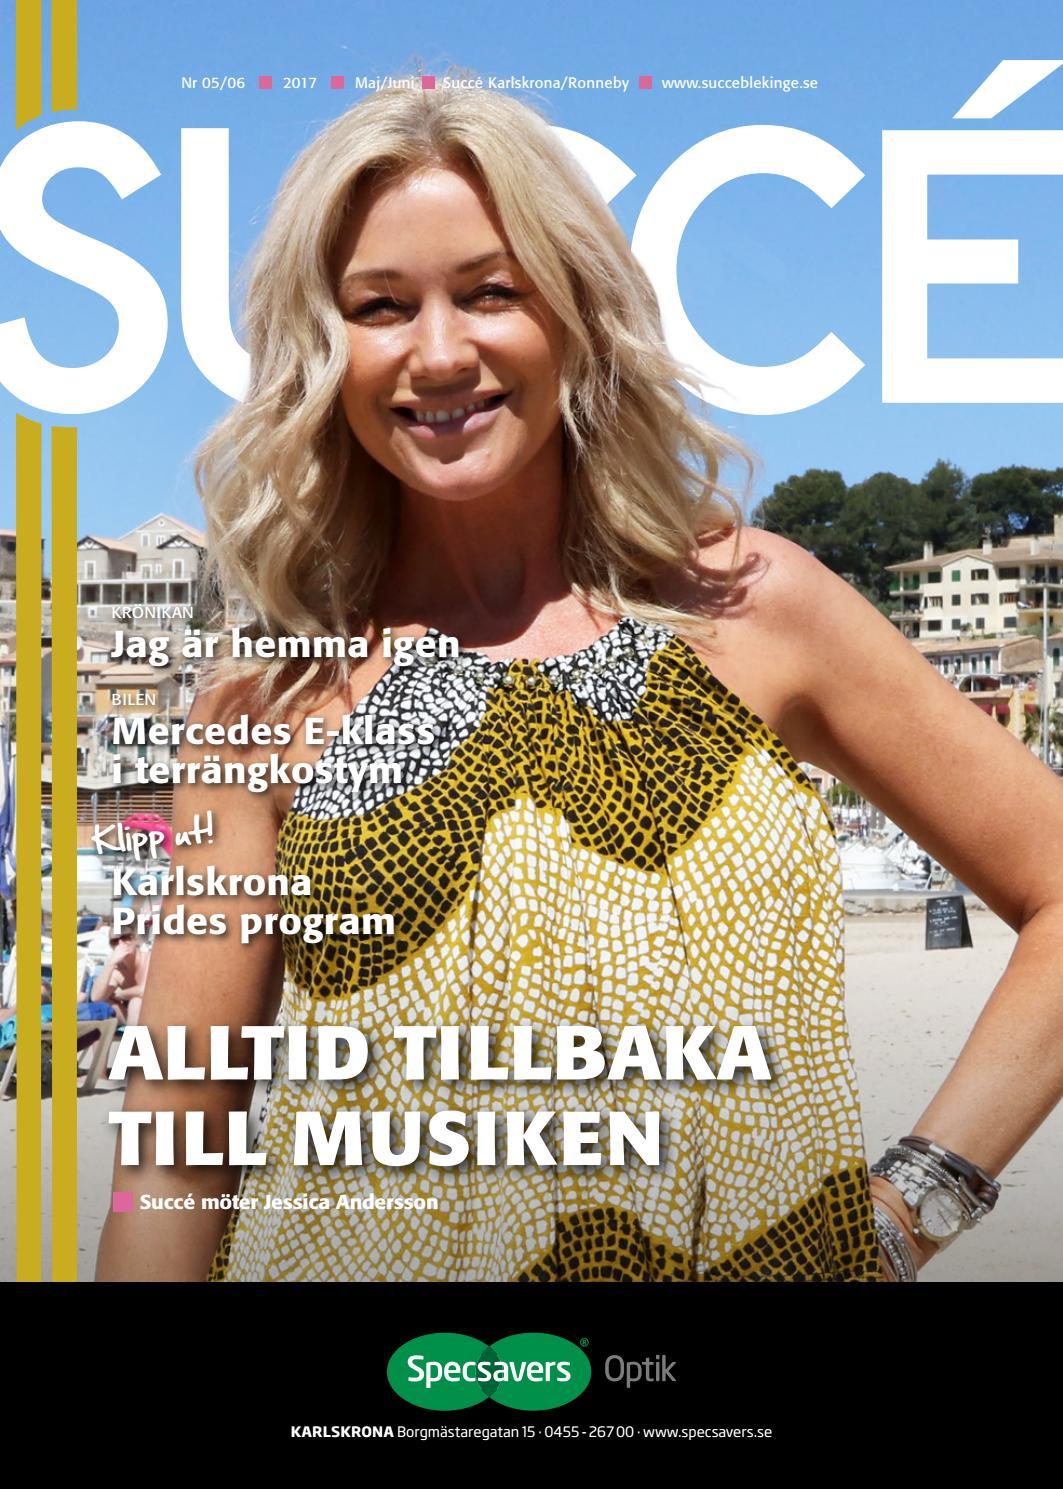 Sarah Ivarsson Nordstrm, Edhult Lycks 1, Trans | satisfaction-survey.net